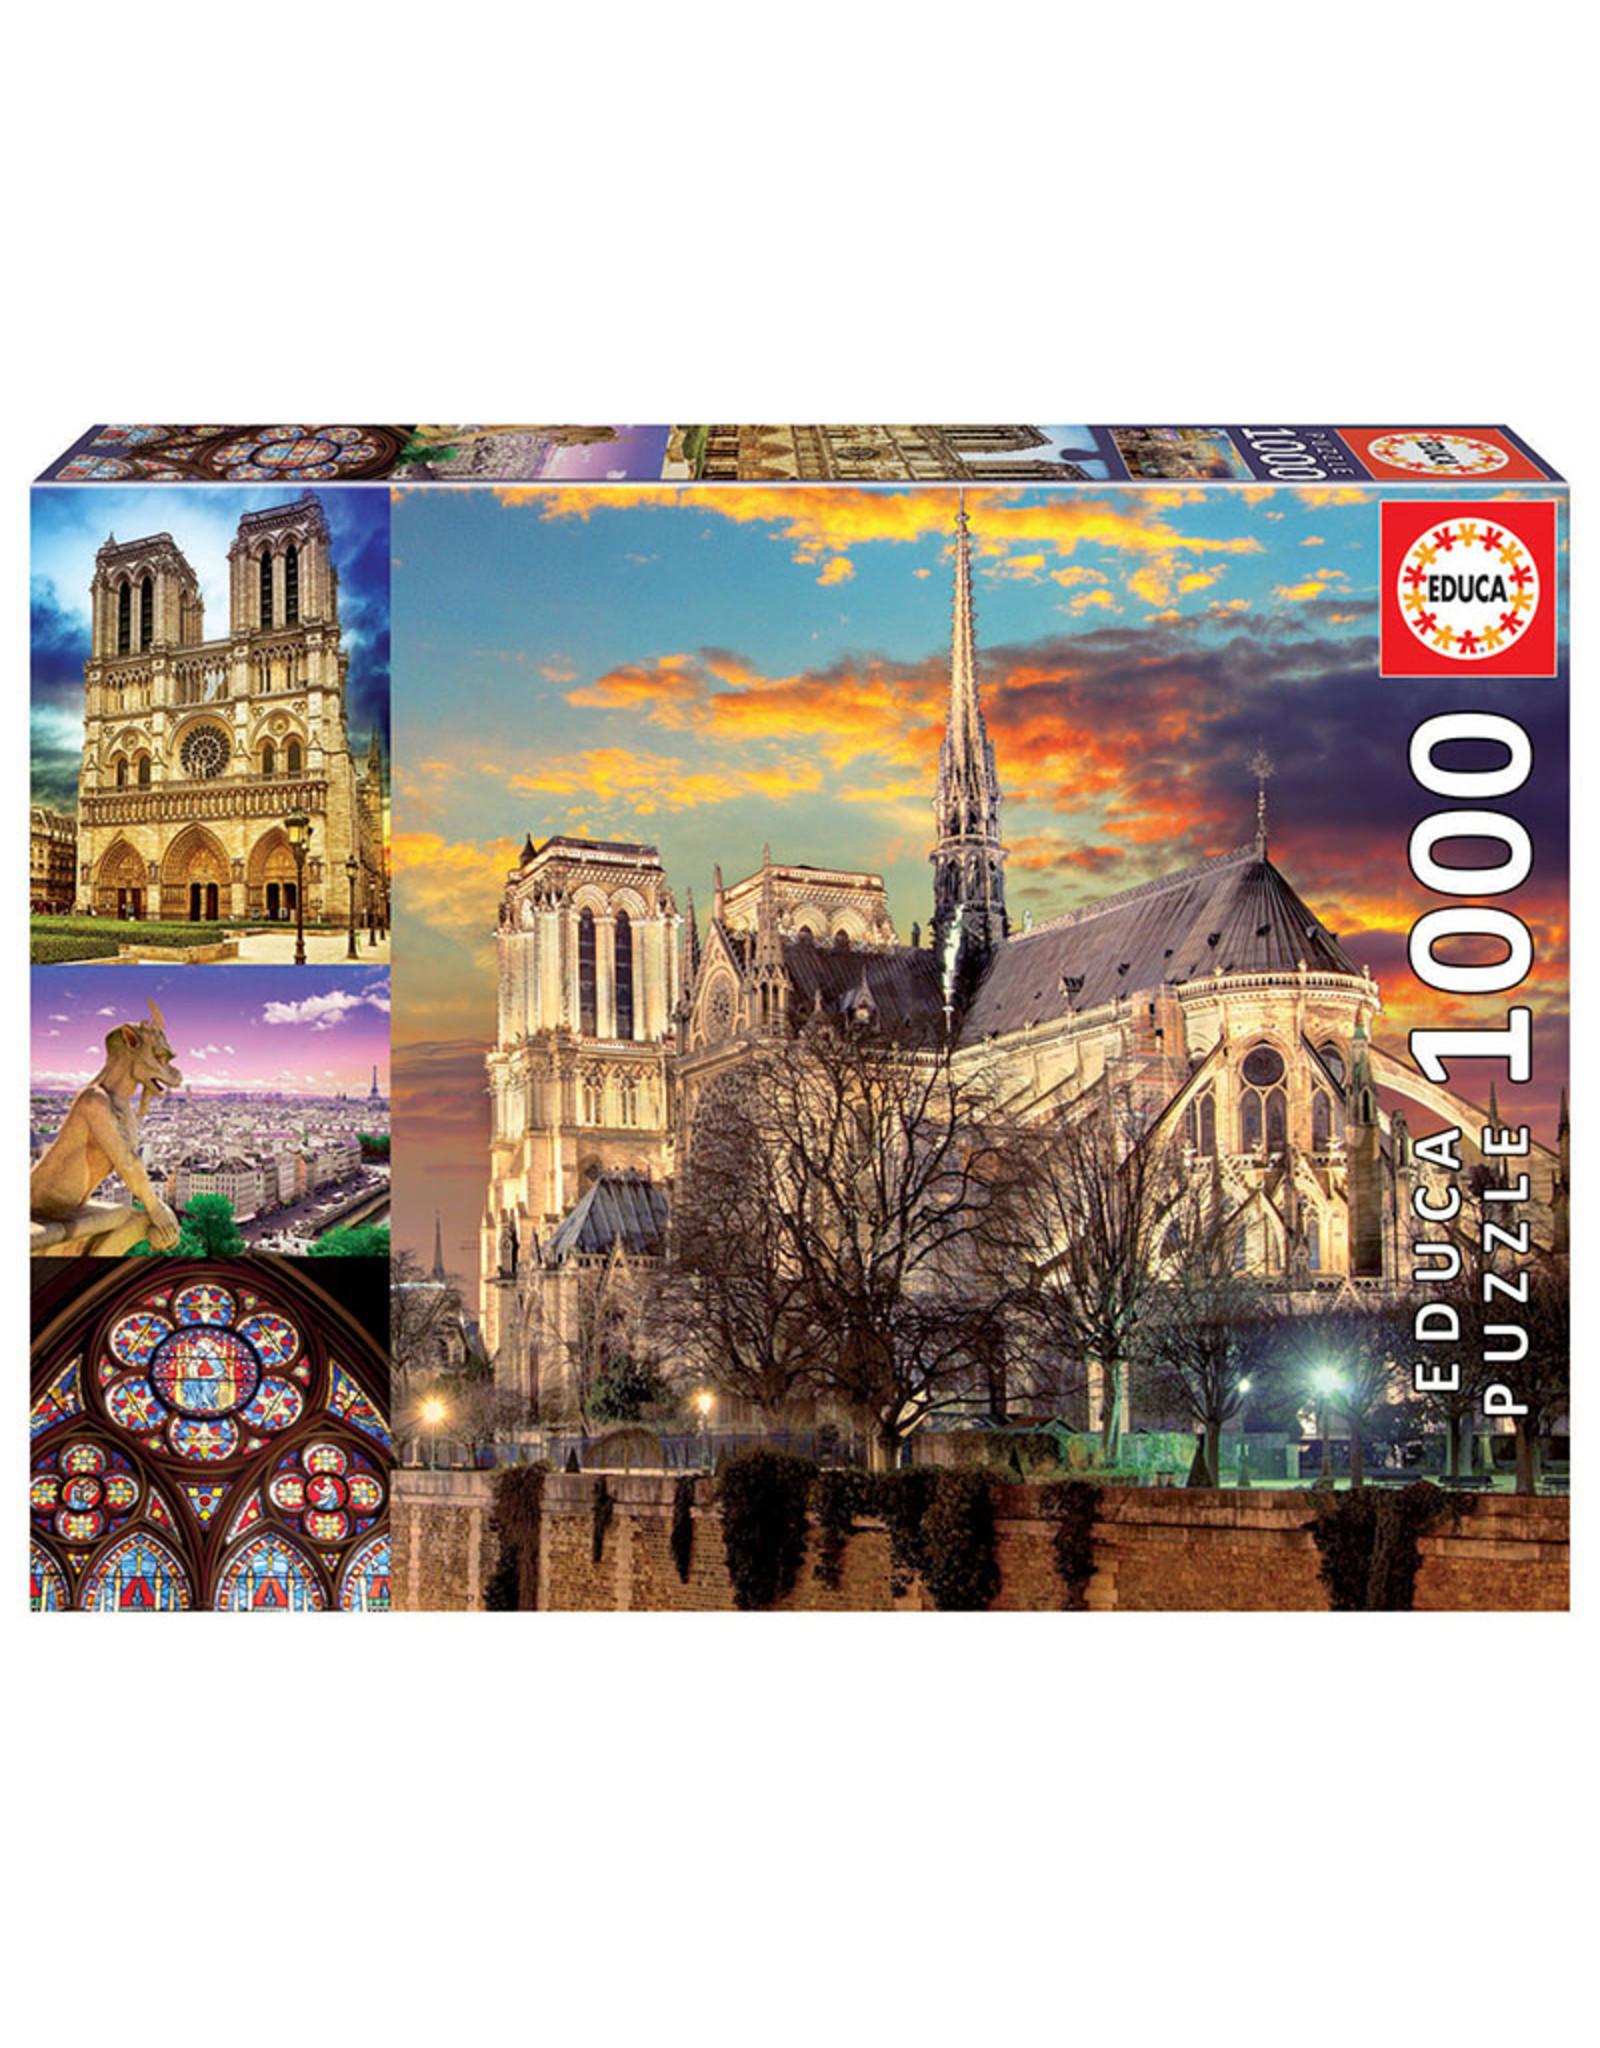 Educa Notre Dame Collage - 1000 Piece Puzzle